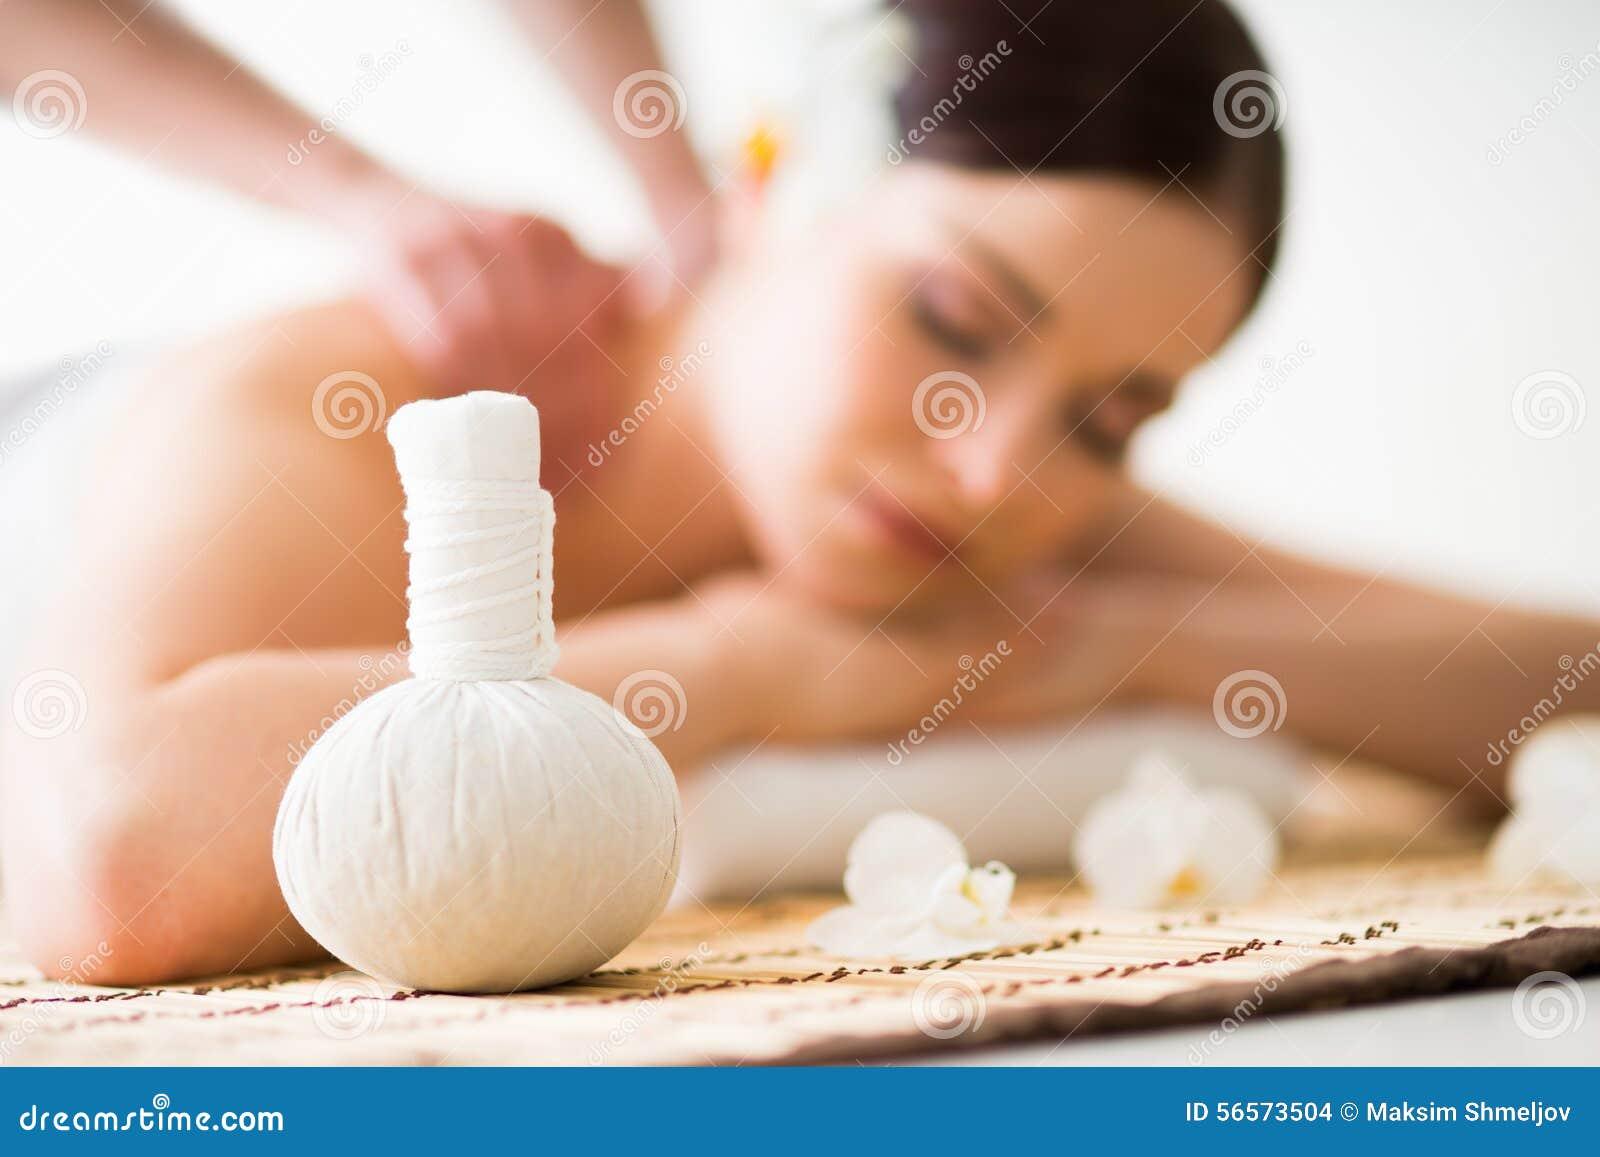 Download Παραδοσιακές ασιατικές θεραπεία αρώματος και θεραπεία ομορφιάς Στοκ Εικόνες - εικόνα από φύση, μασάζ: 56573504